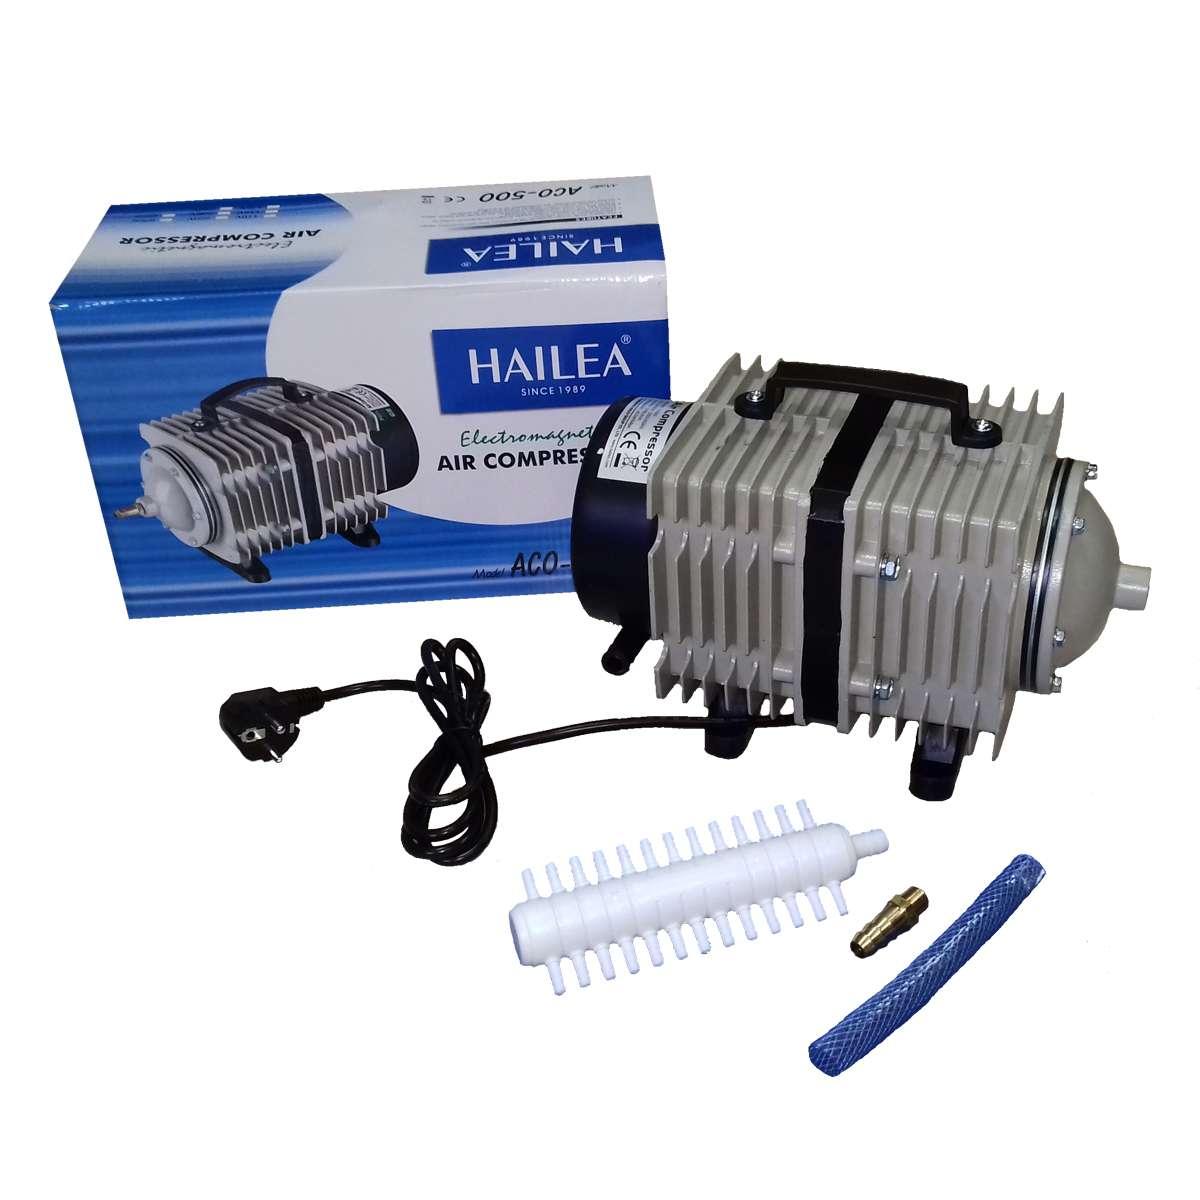 Компрессор для пруда Hailea ACO-500